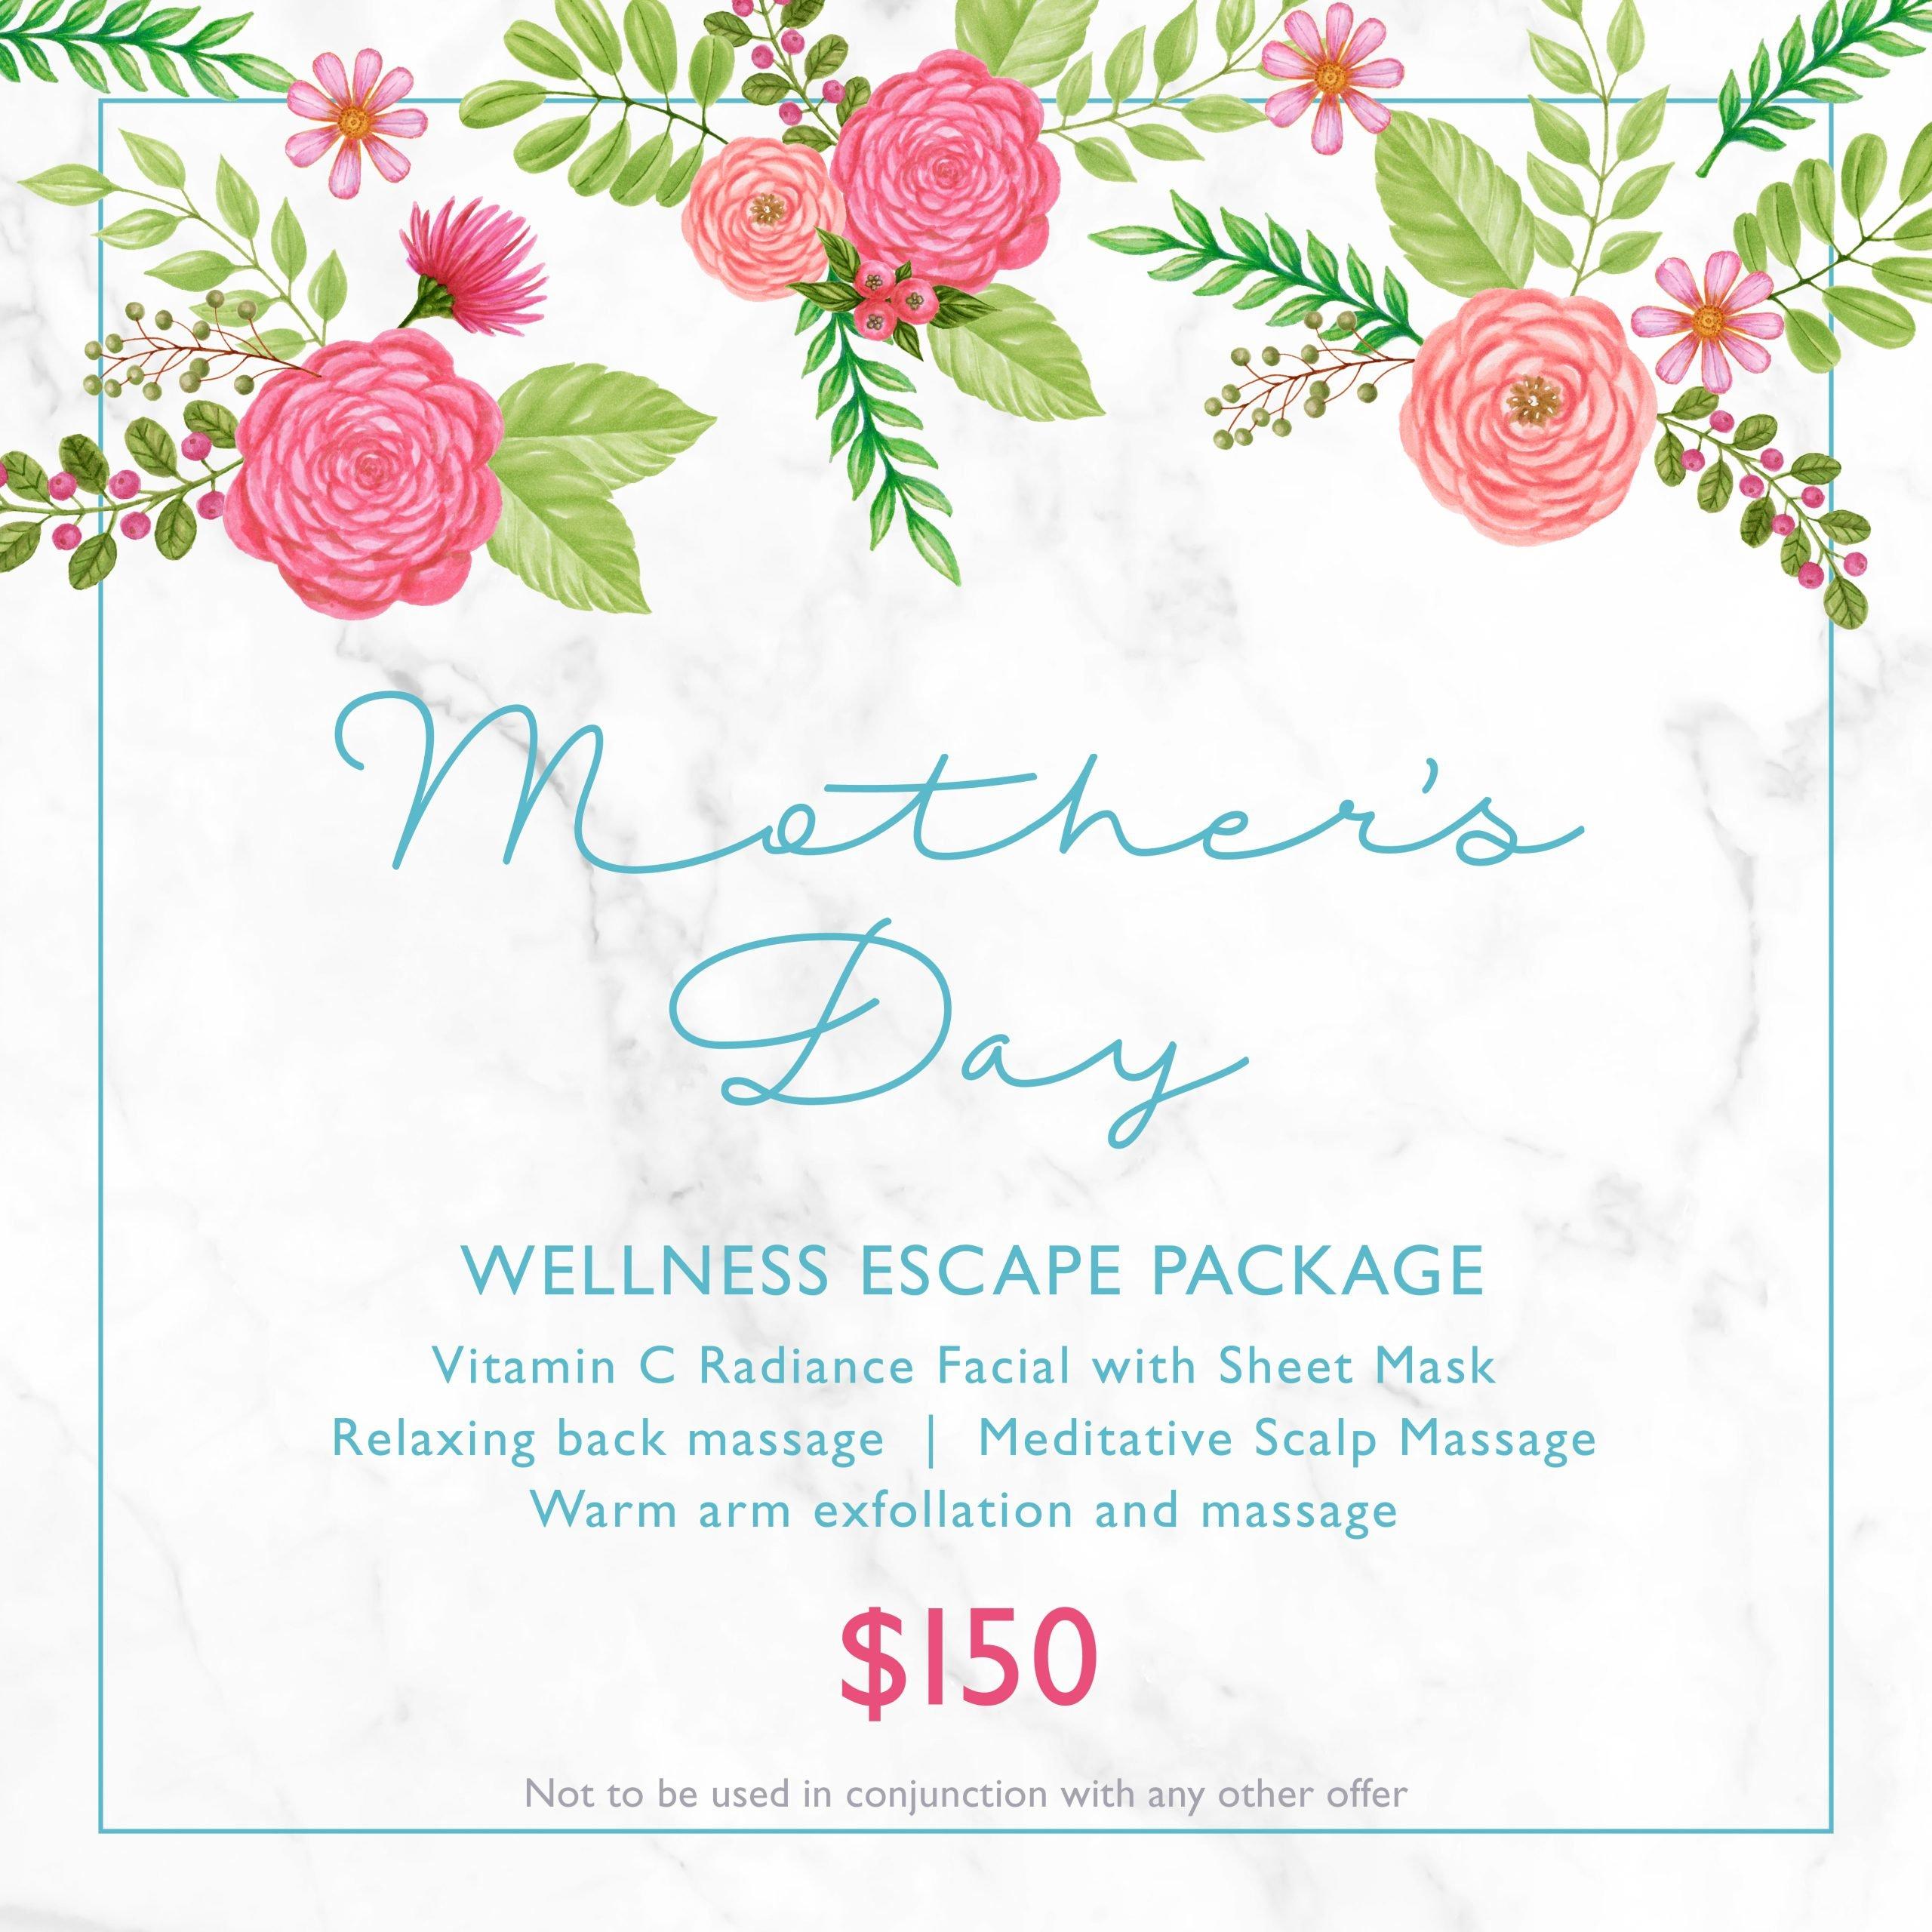 MothersDayWellness_social